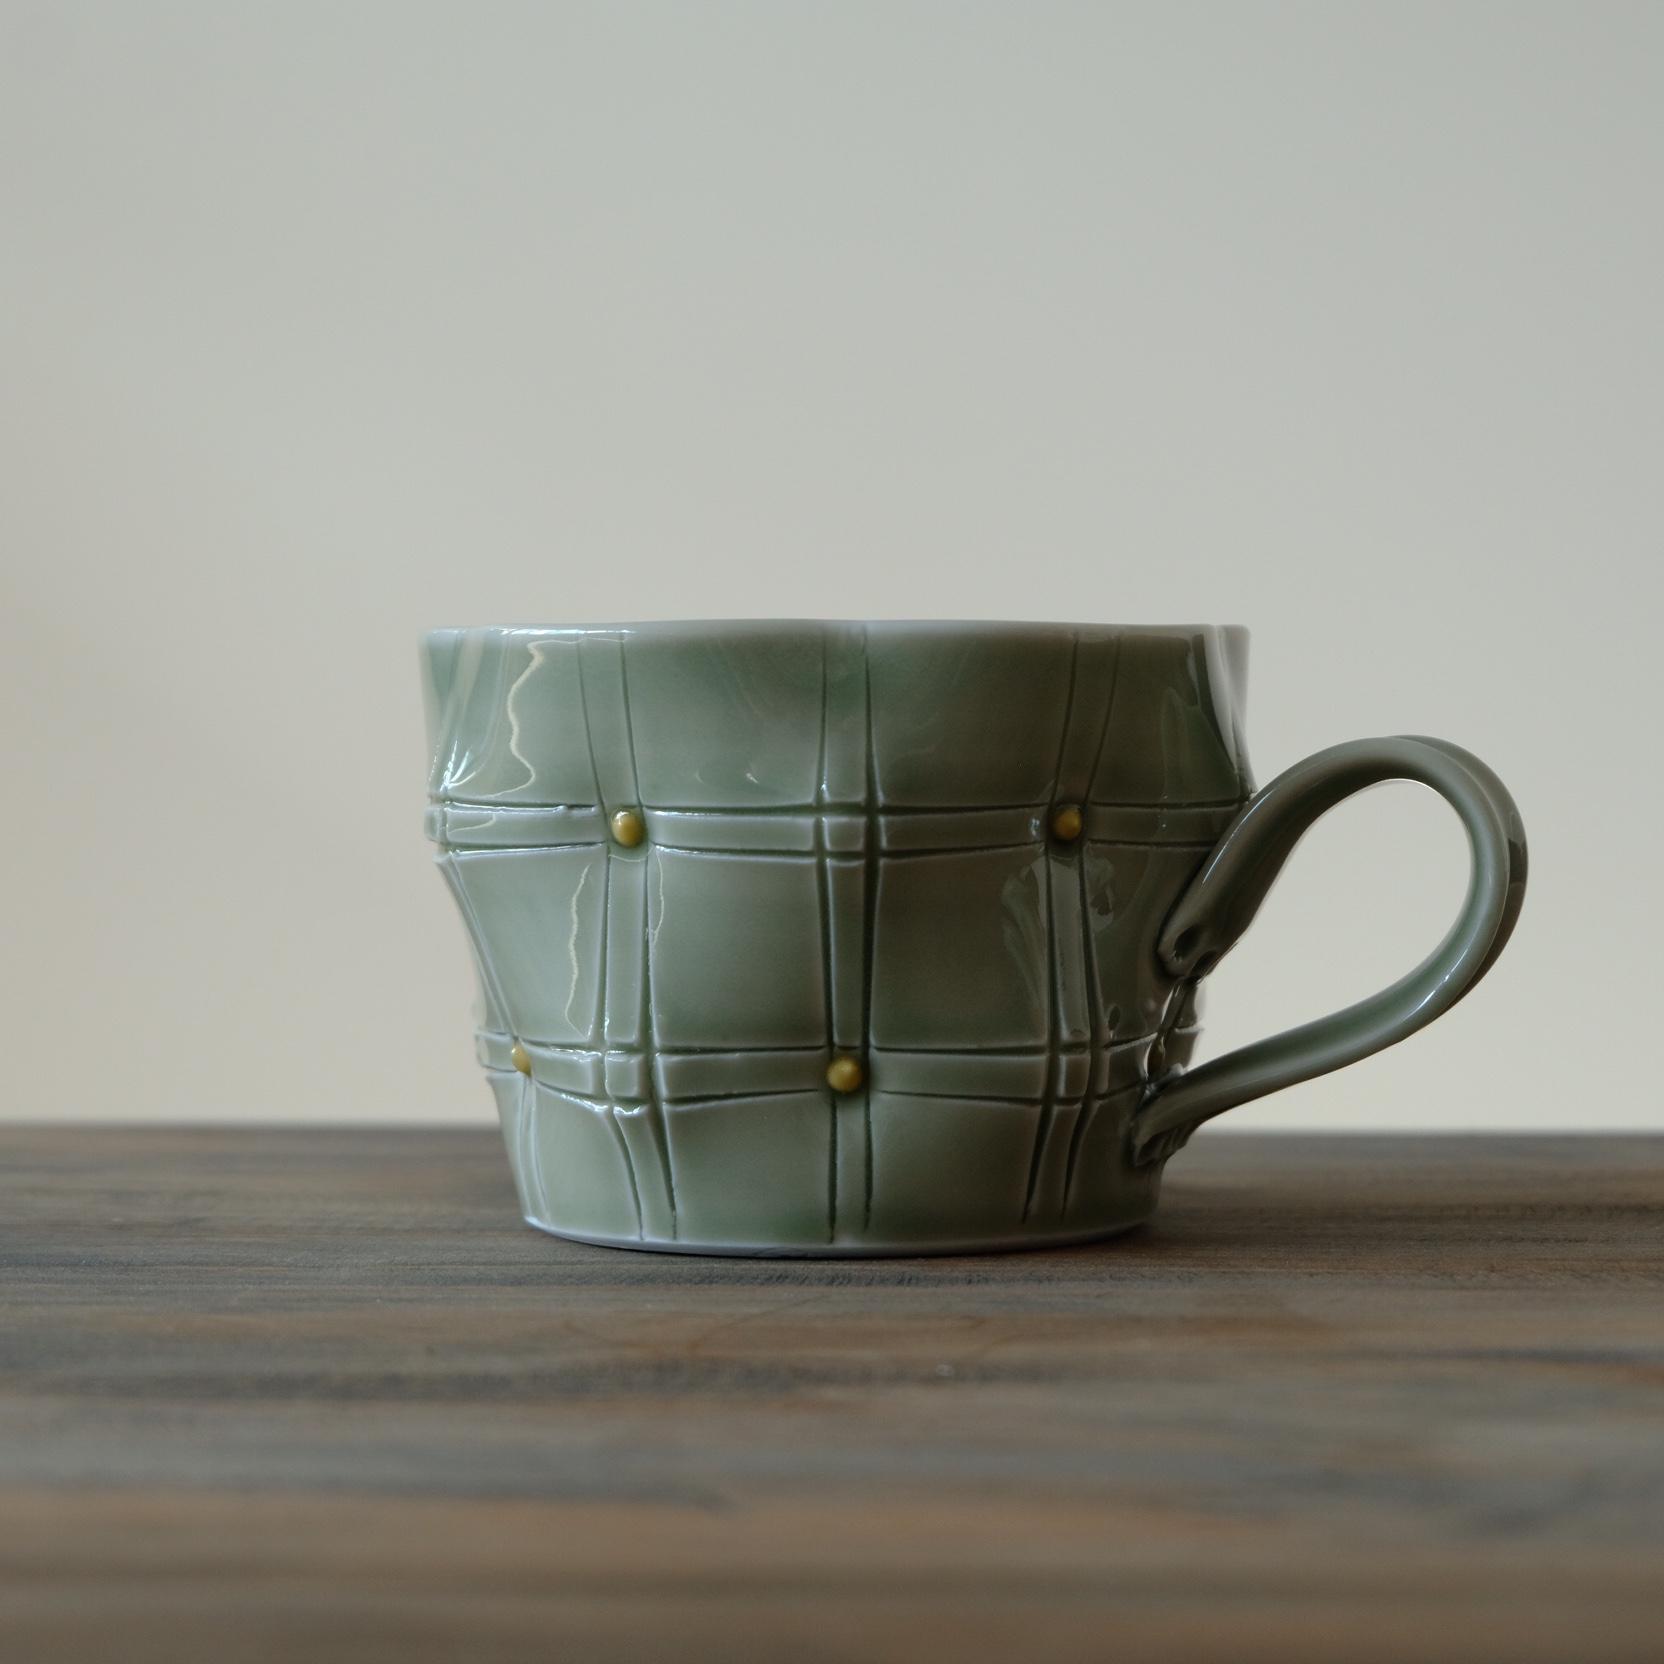 Rongjishang new gengdao brocade line series handmade pottery vessels large capacity coffee cup flower drawing Mug